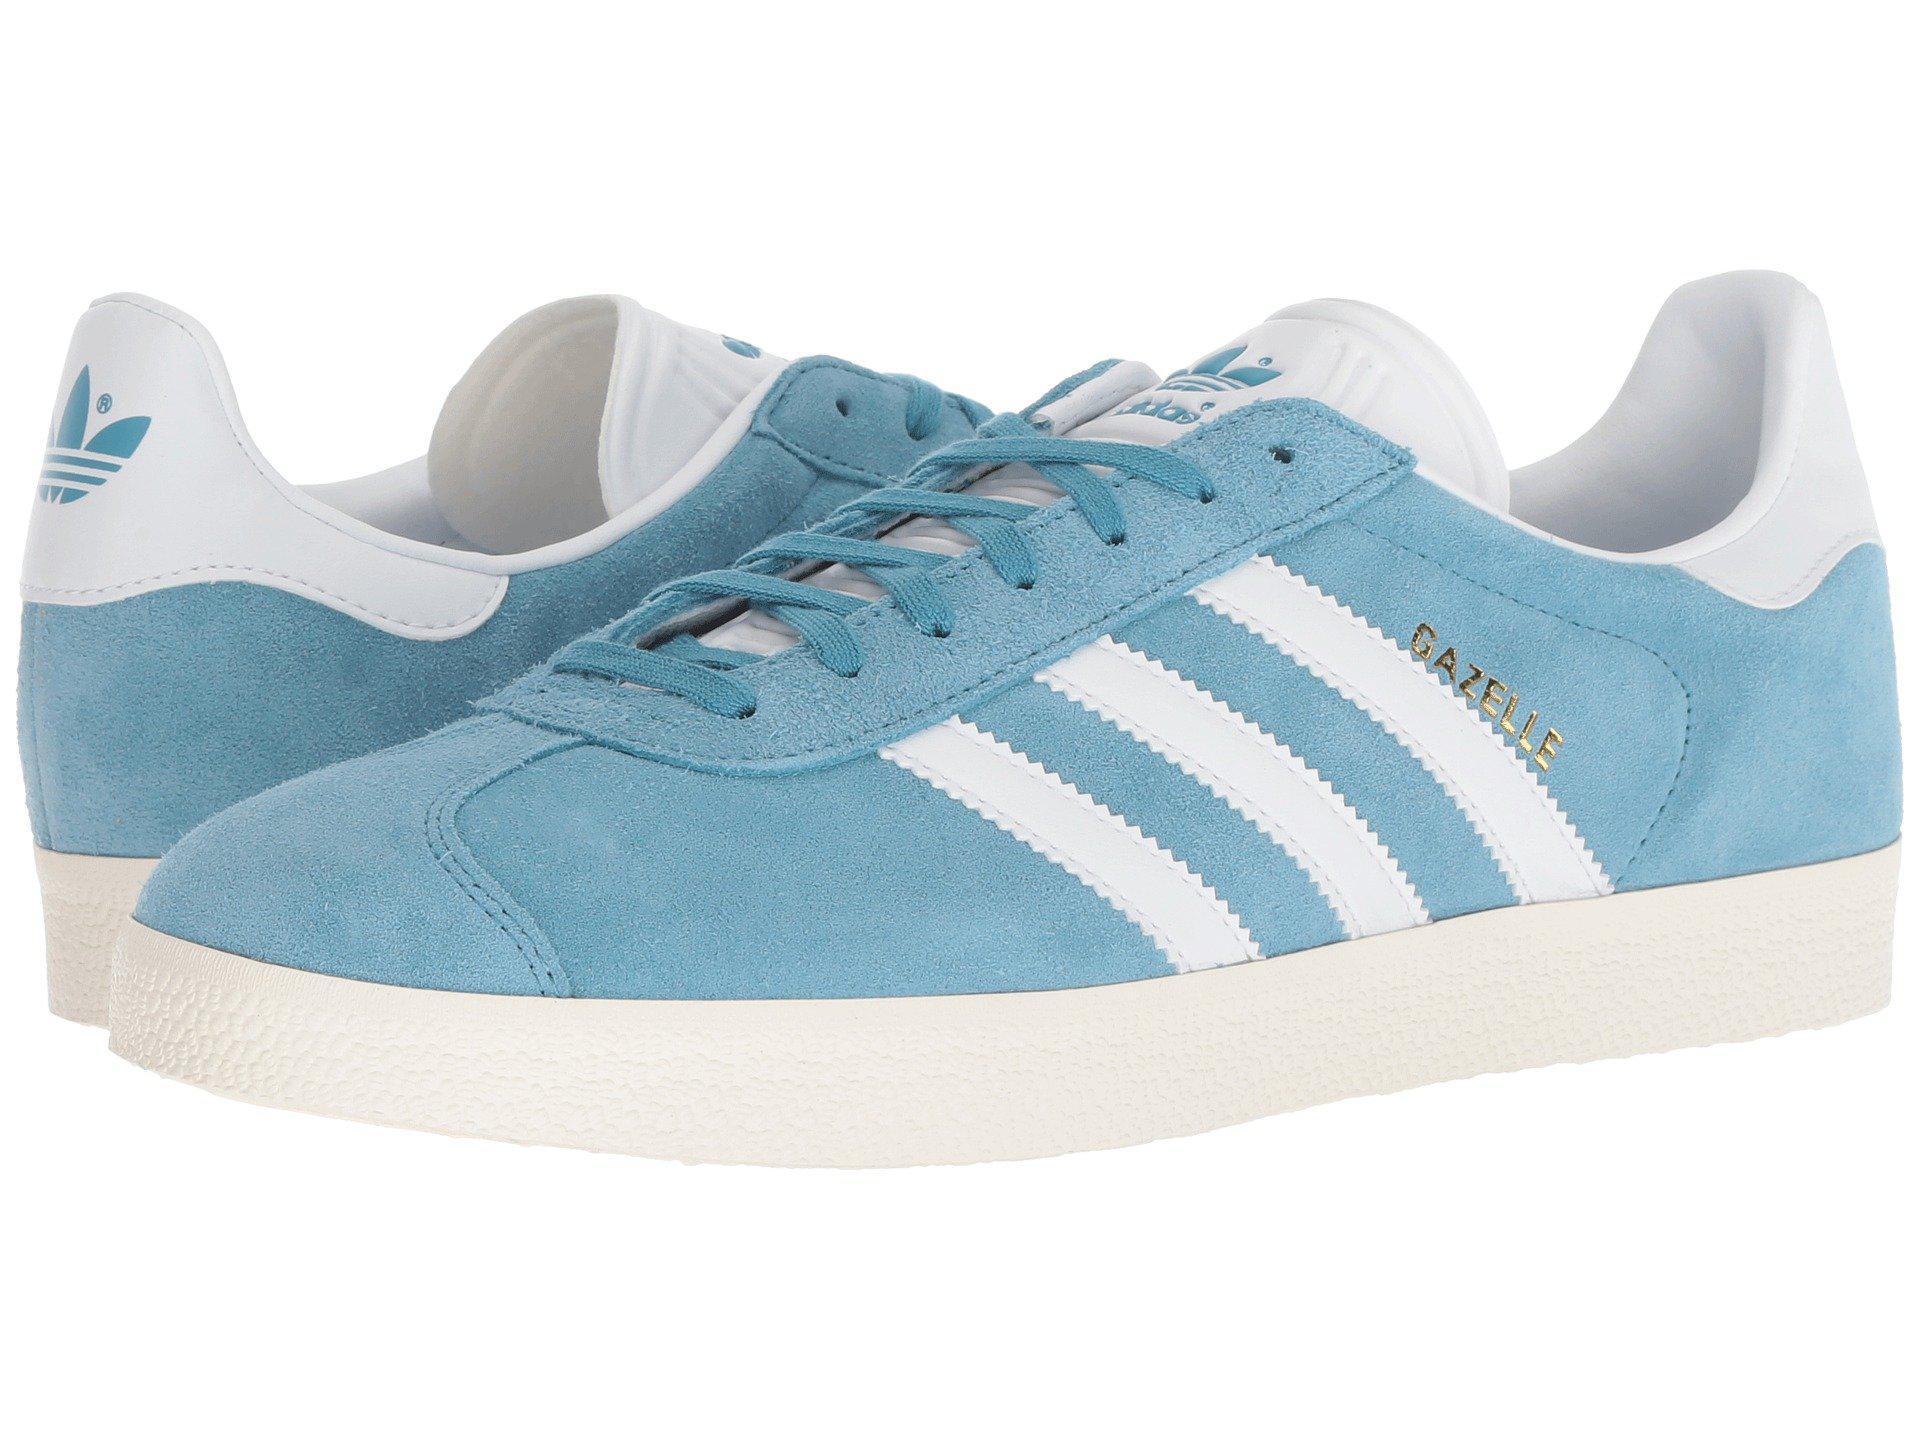 Originals Gazelle (sky Blue Suede) Men's Shoes